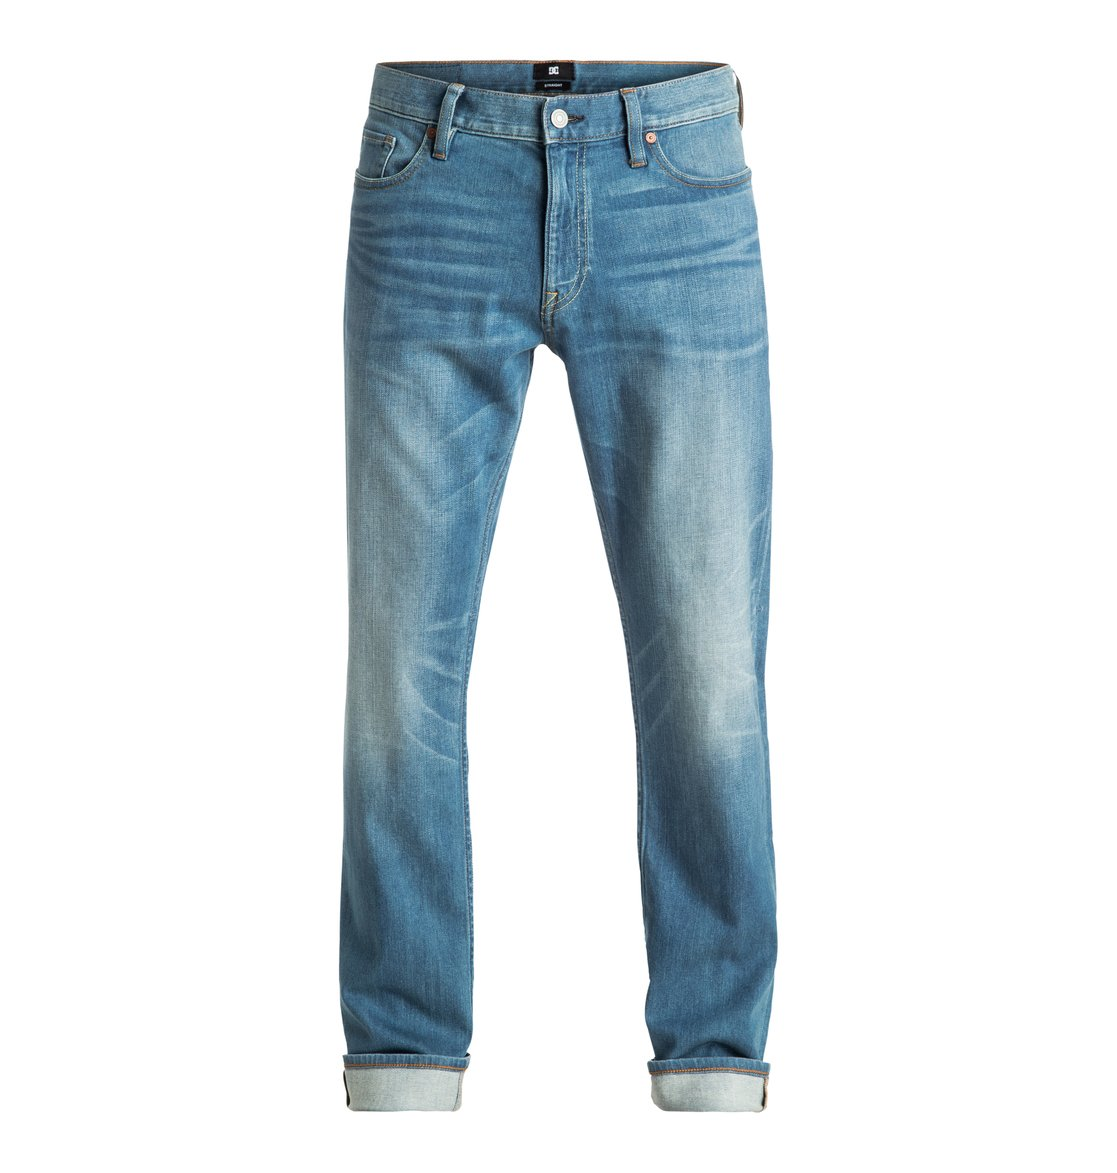 dc shoes Worker Medium Stone - Jeans Vestibilità Straight da Uomo - Blue - DC Shoes geOXYRnA6h